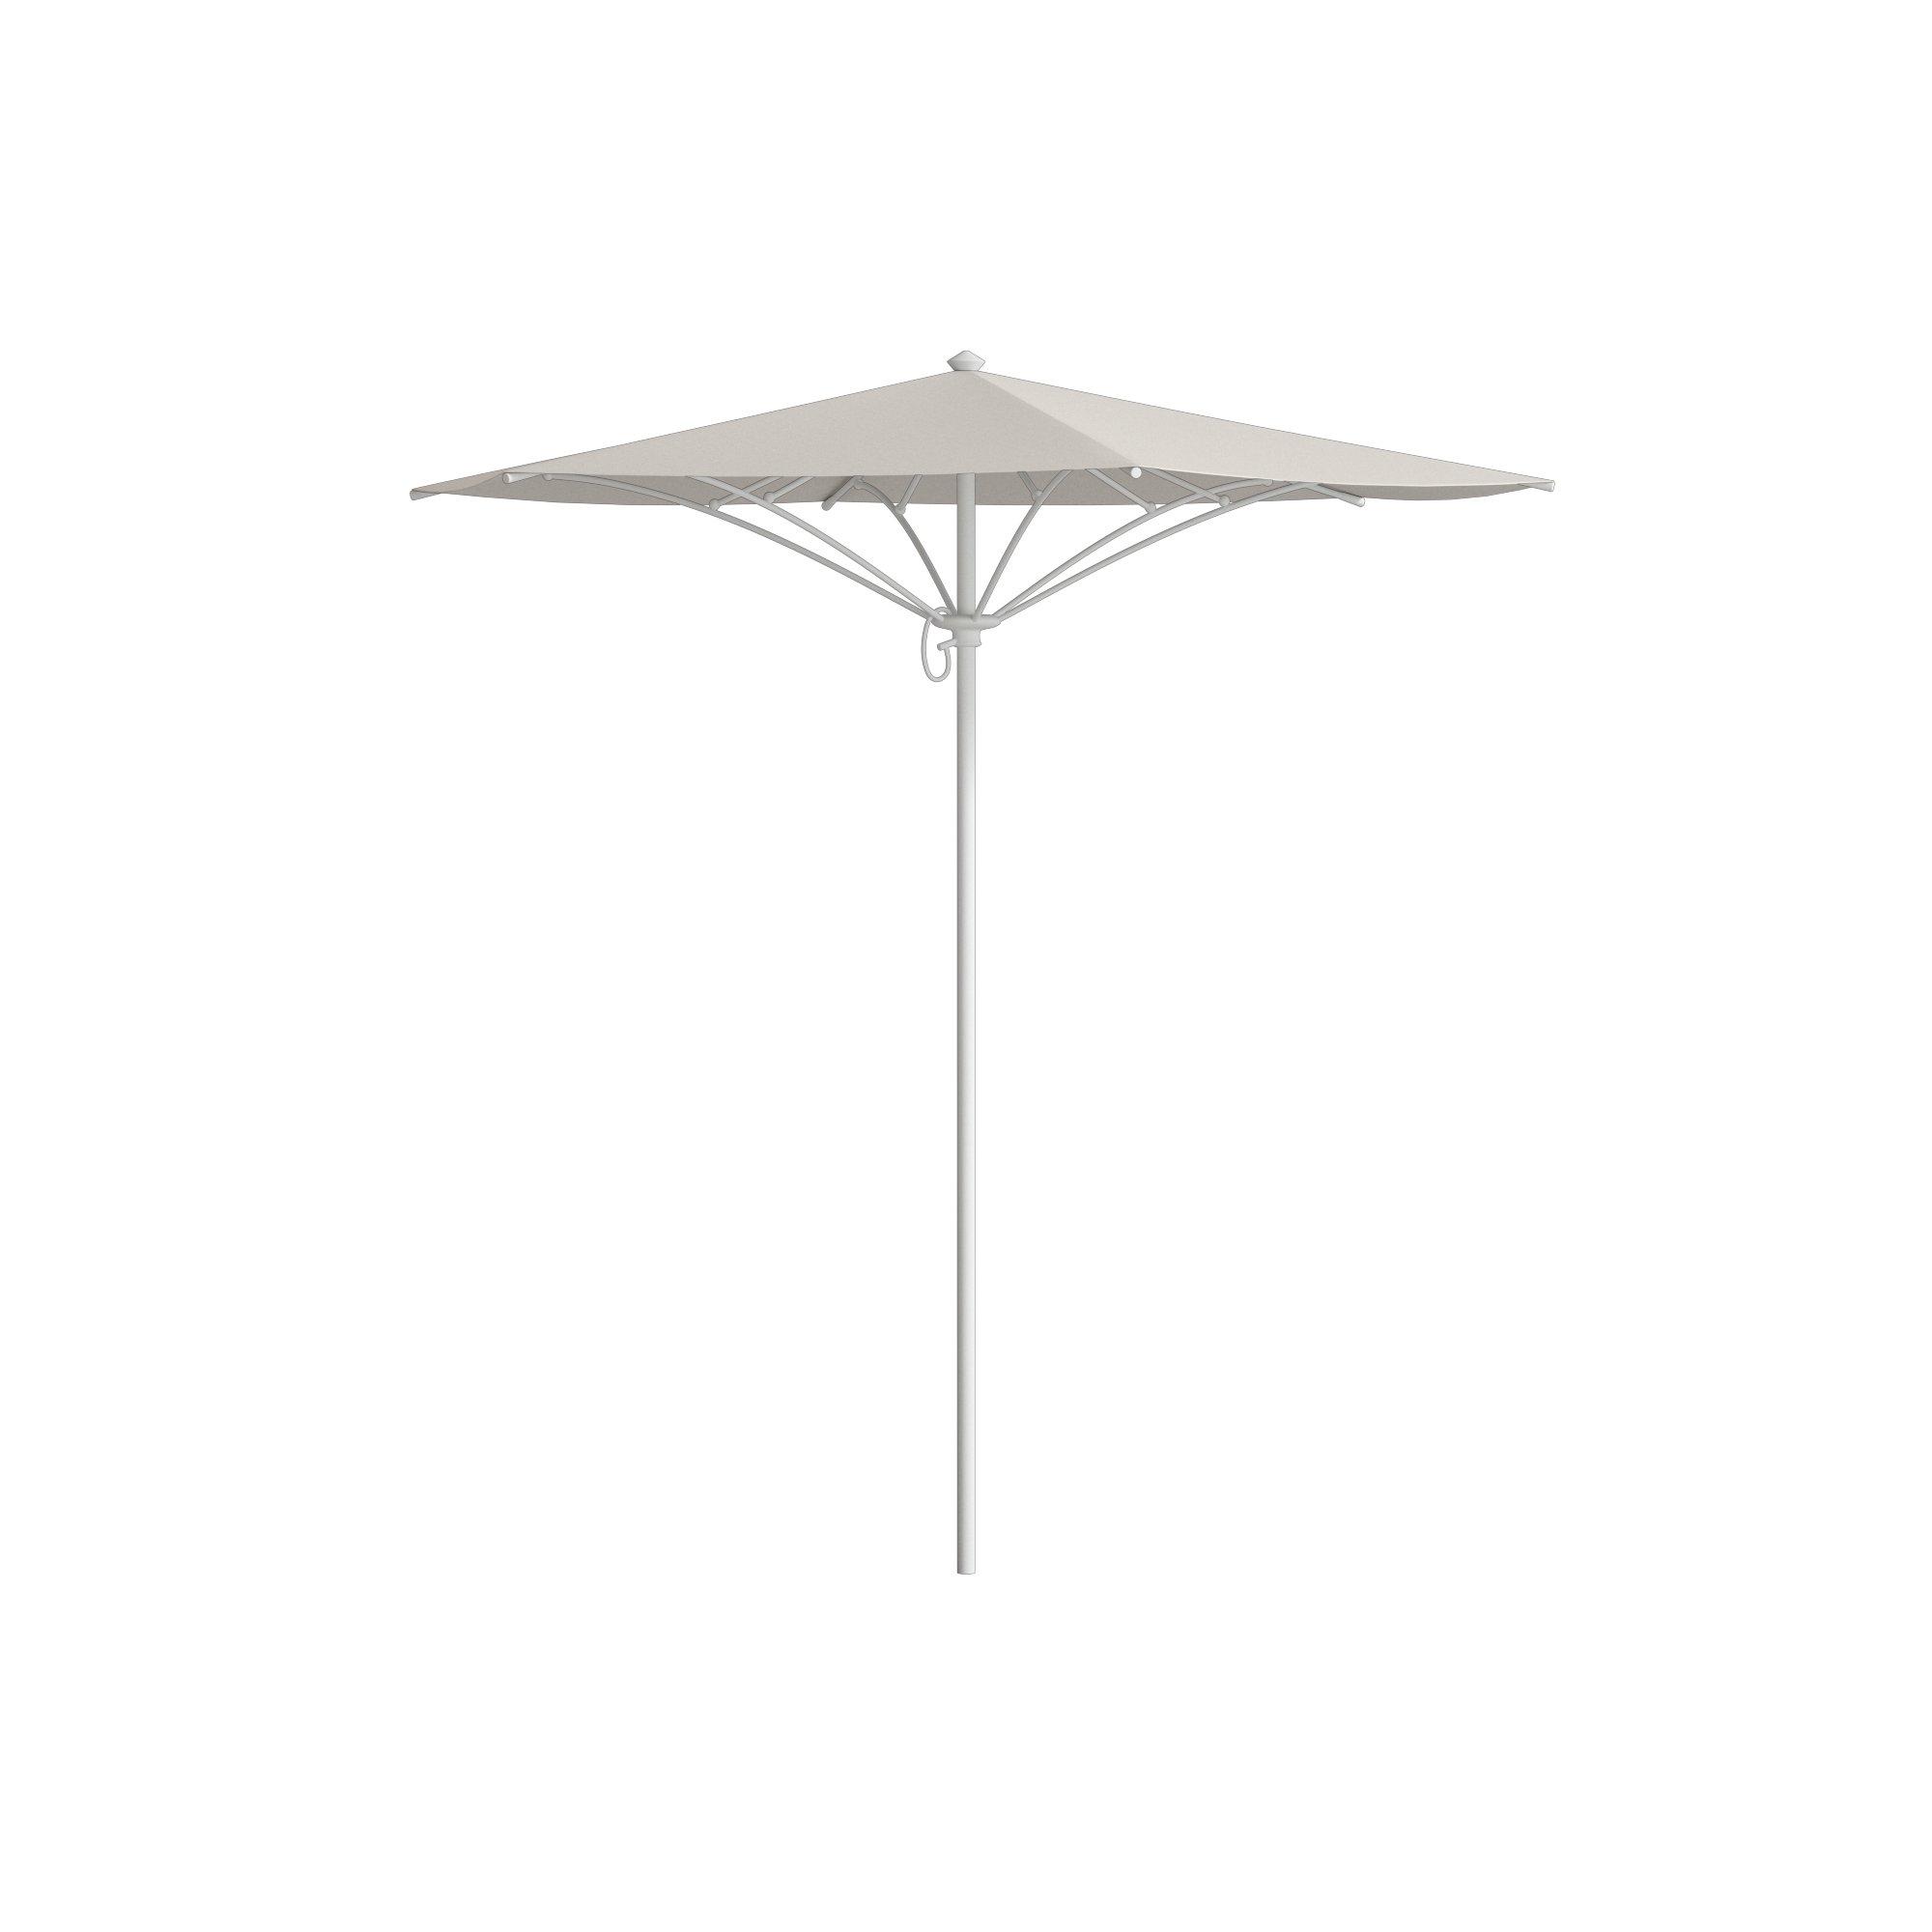 Trace 8' Market Umbrella Throughout Fashionable Darwen Tiltable Patio Stripe Market Umbrellas (View 16 of 20)